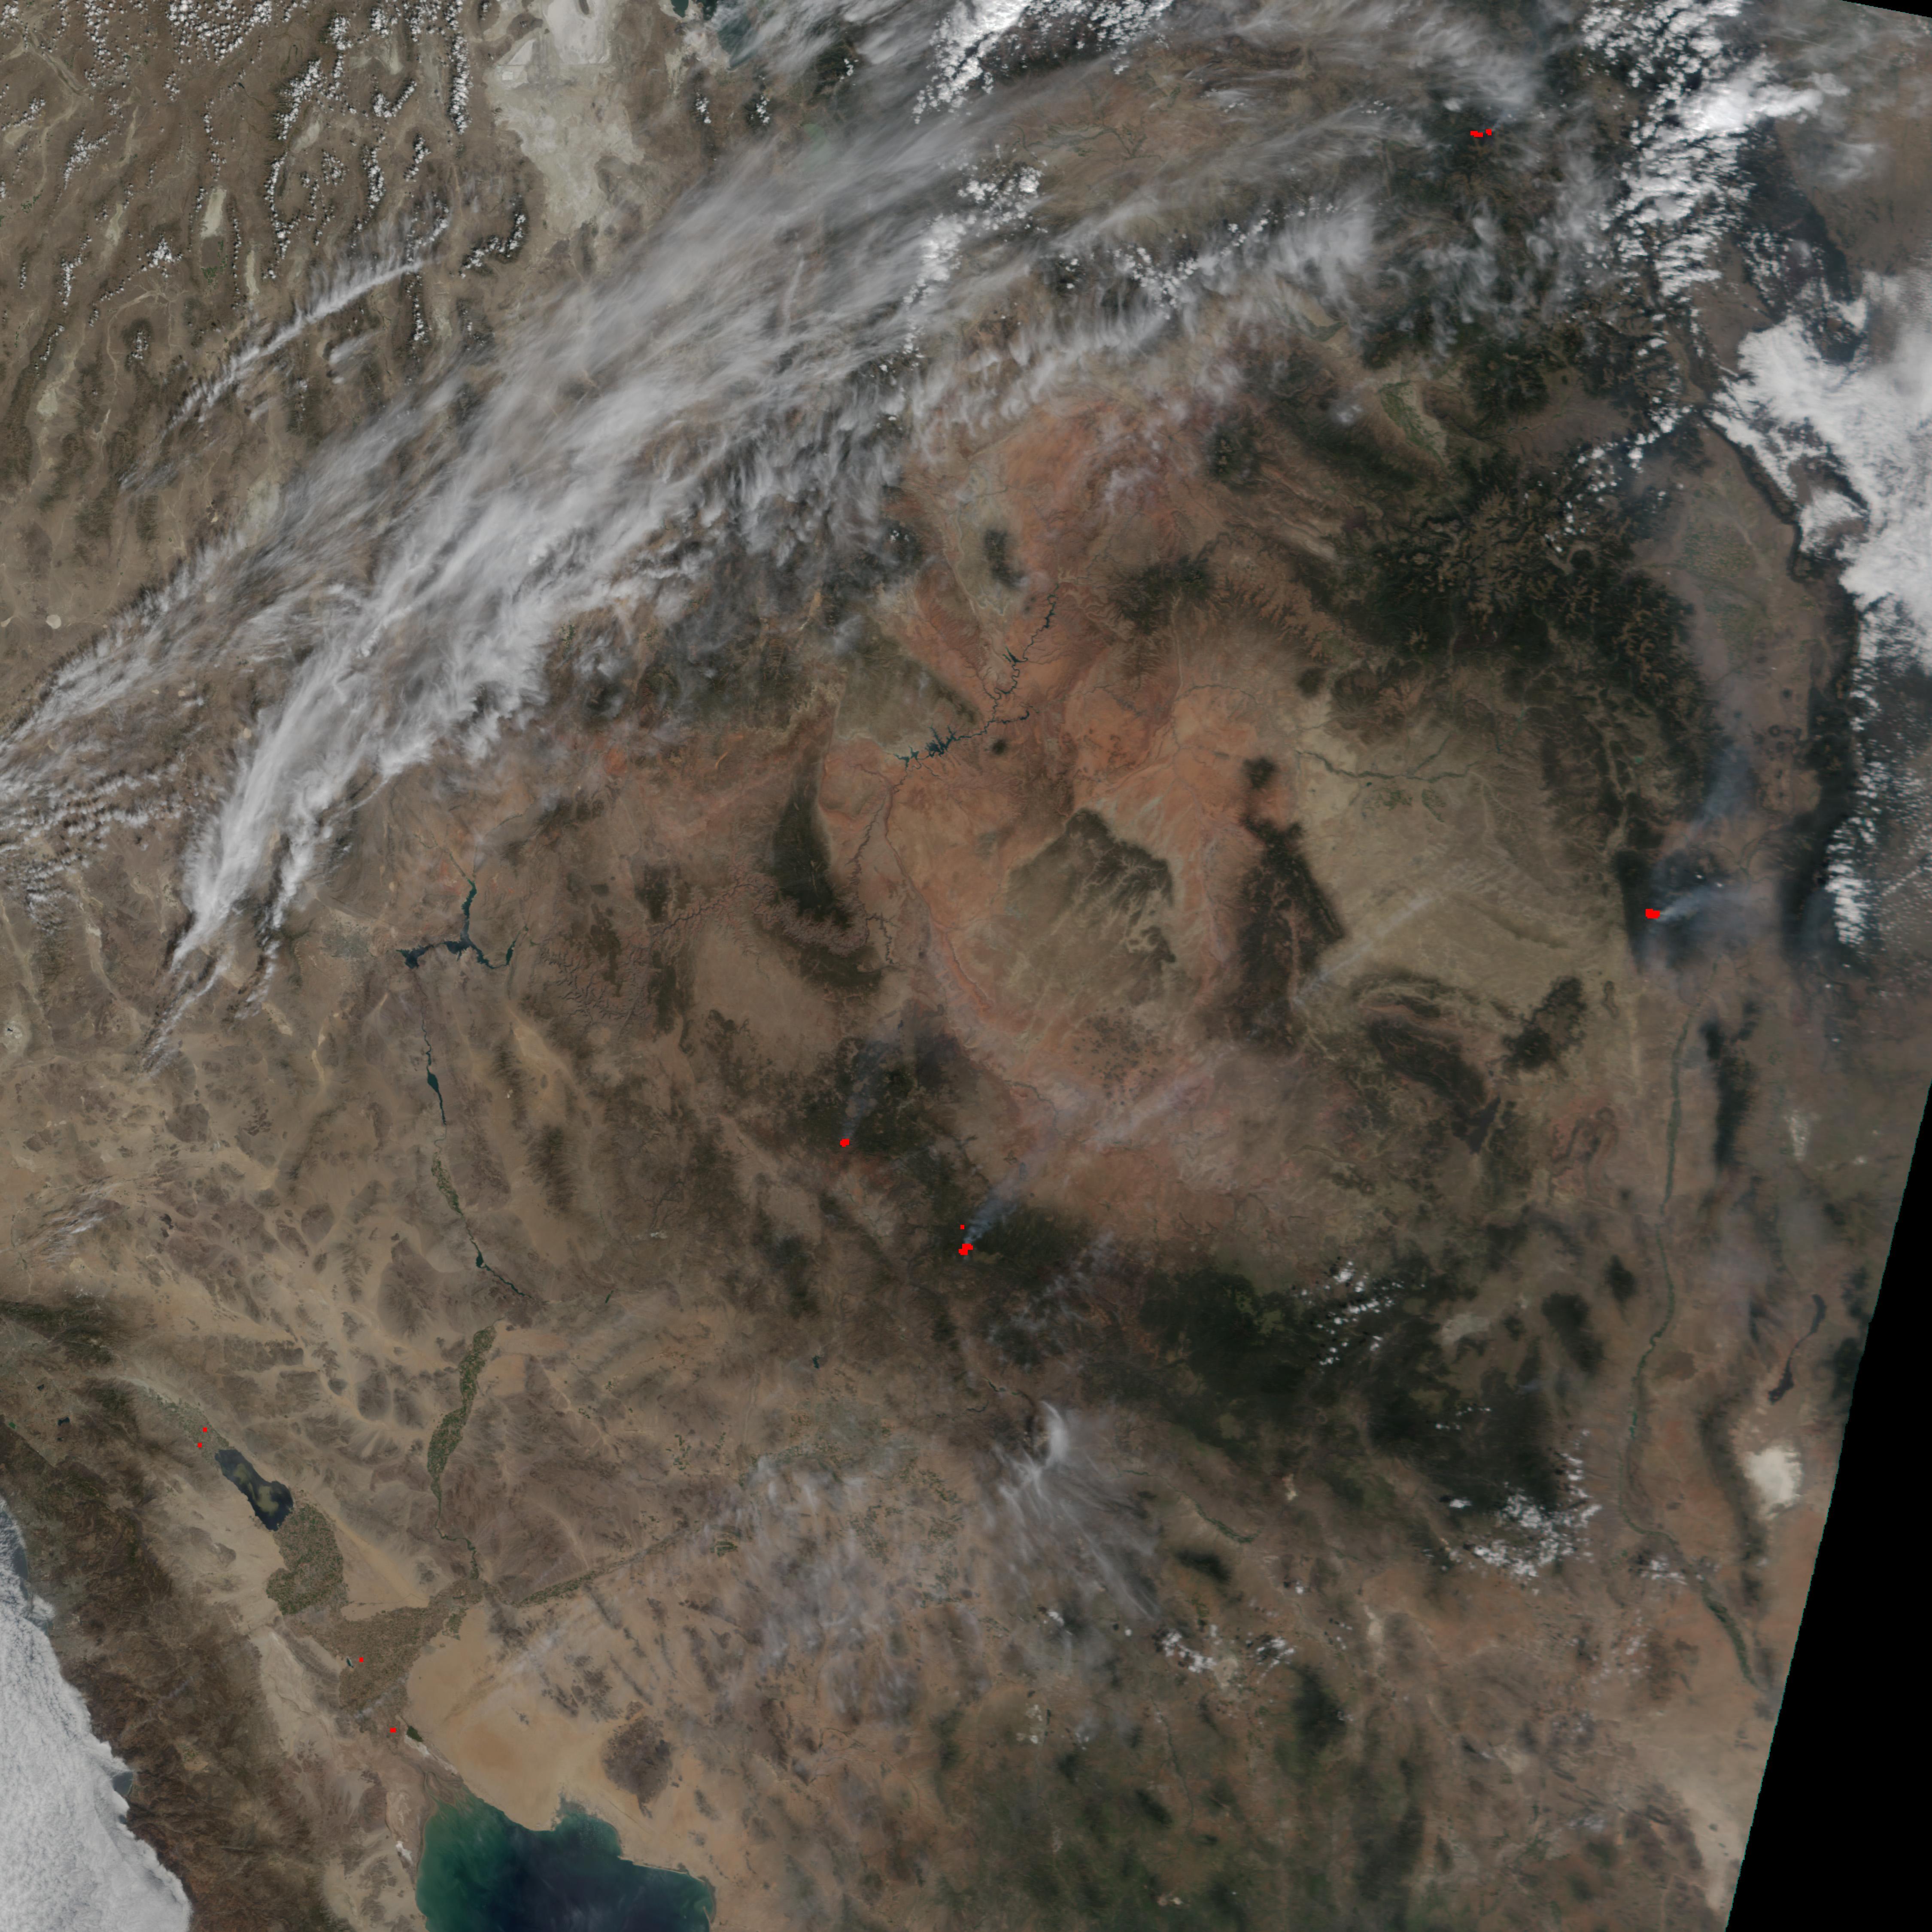 Incendio Trick cerca de Williams, Arizona